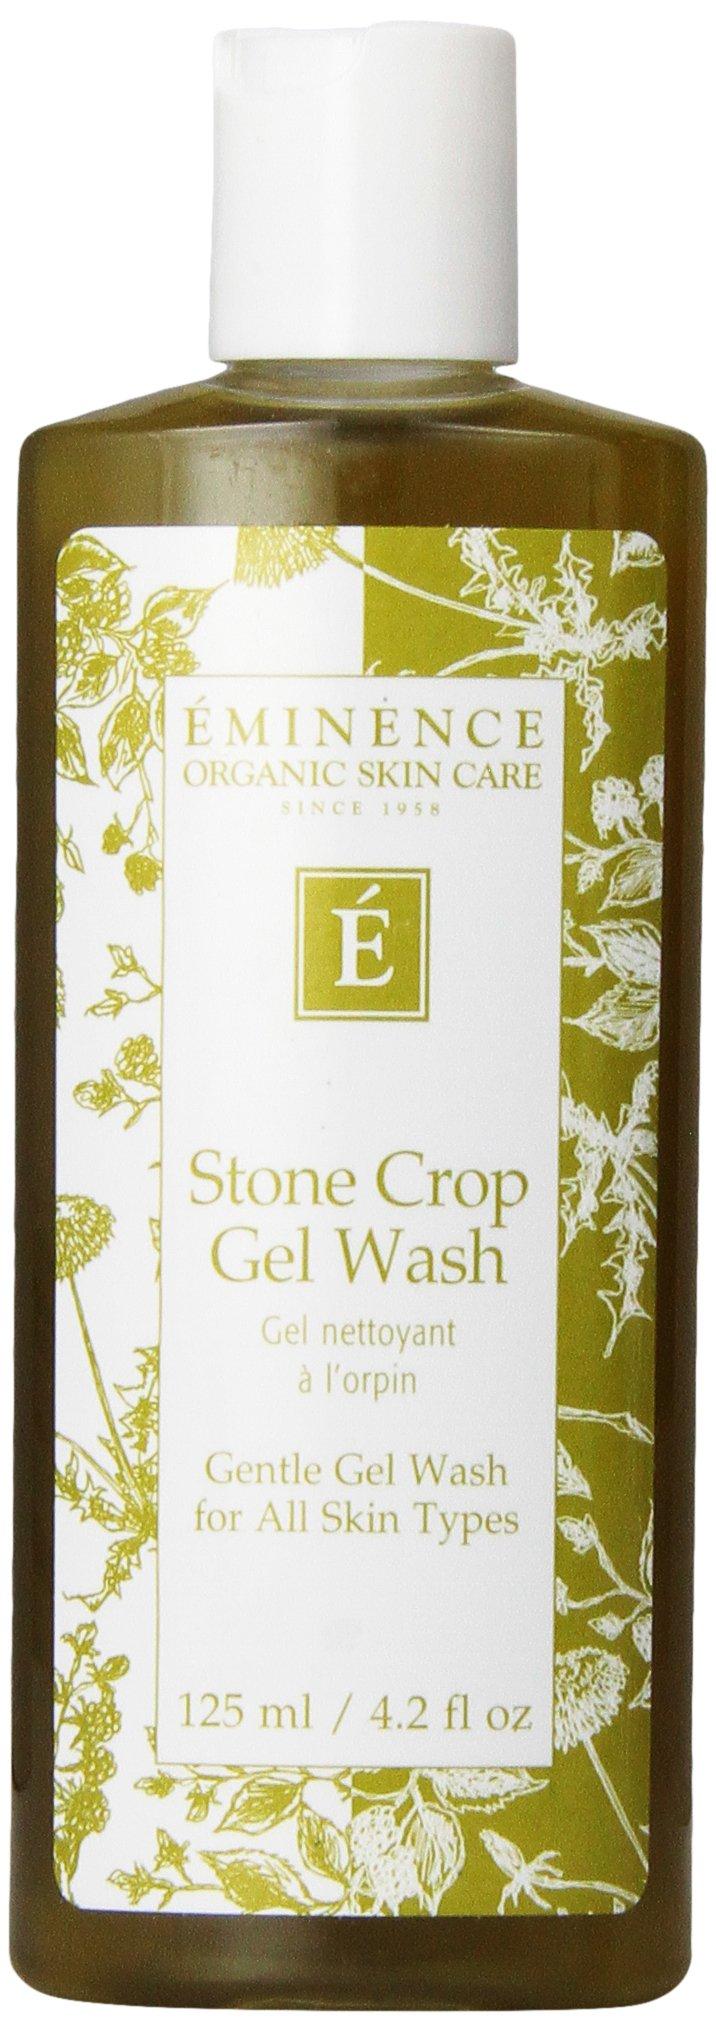 Eminence Stone Crop Gel Wash, 4.2 Fluid Ounce by Eminence